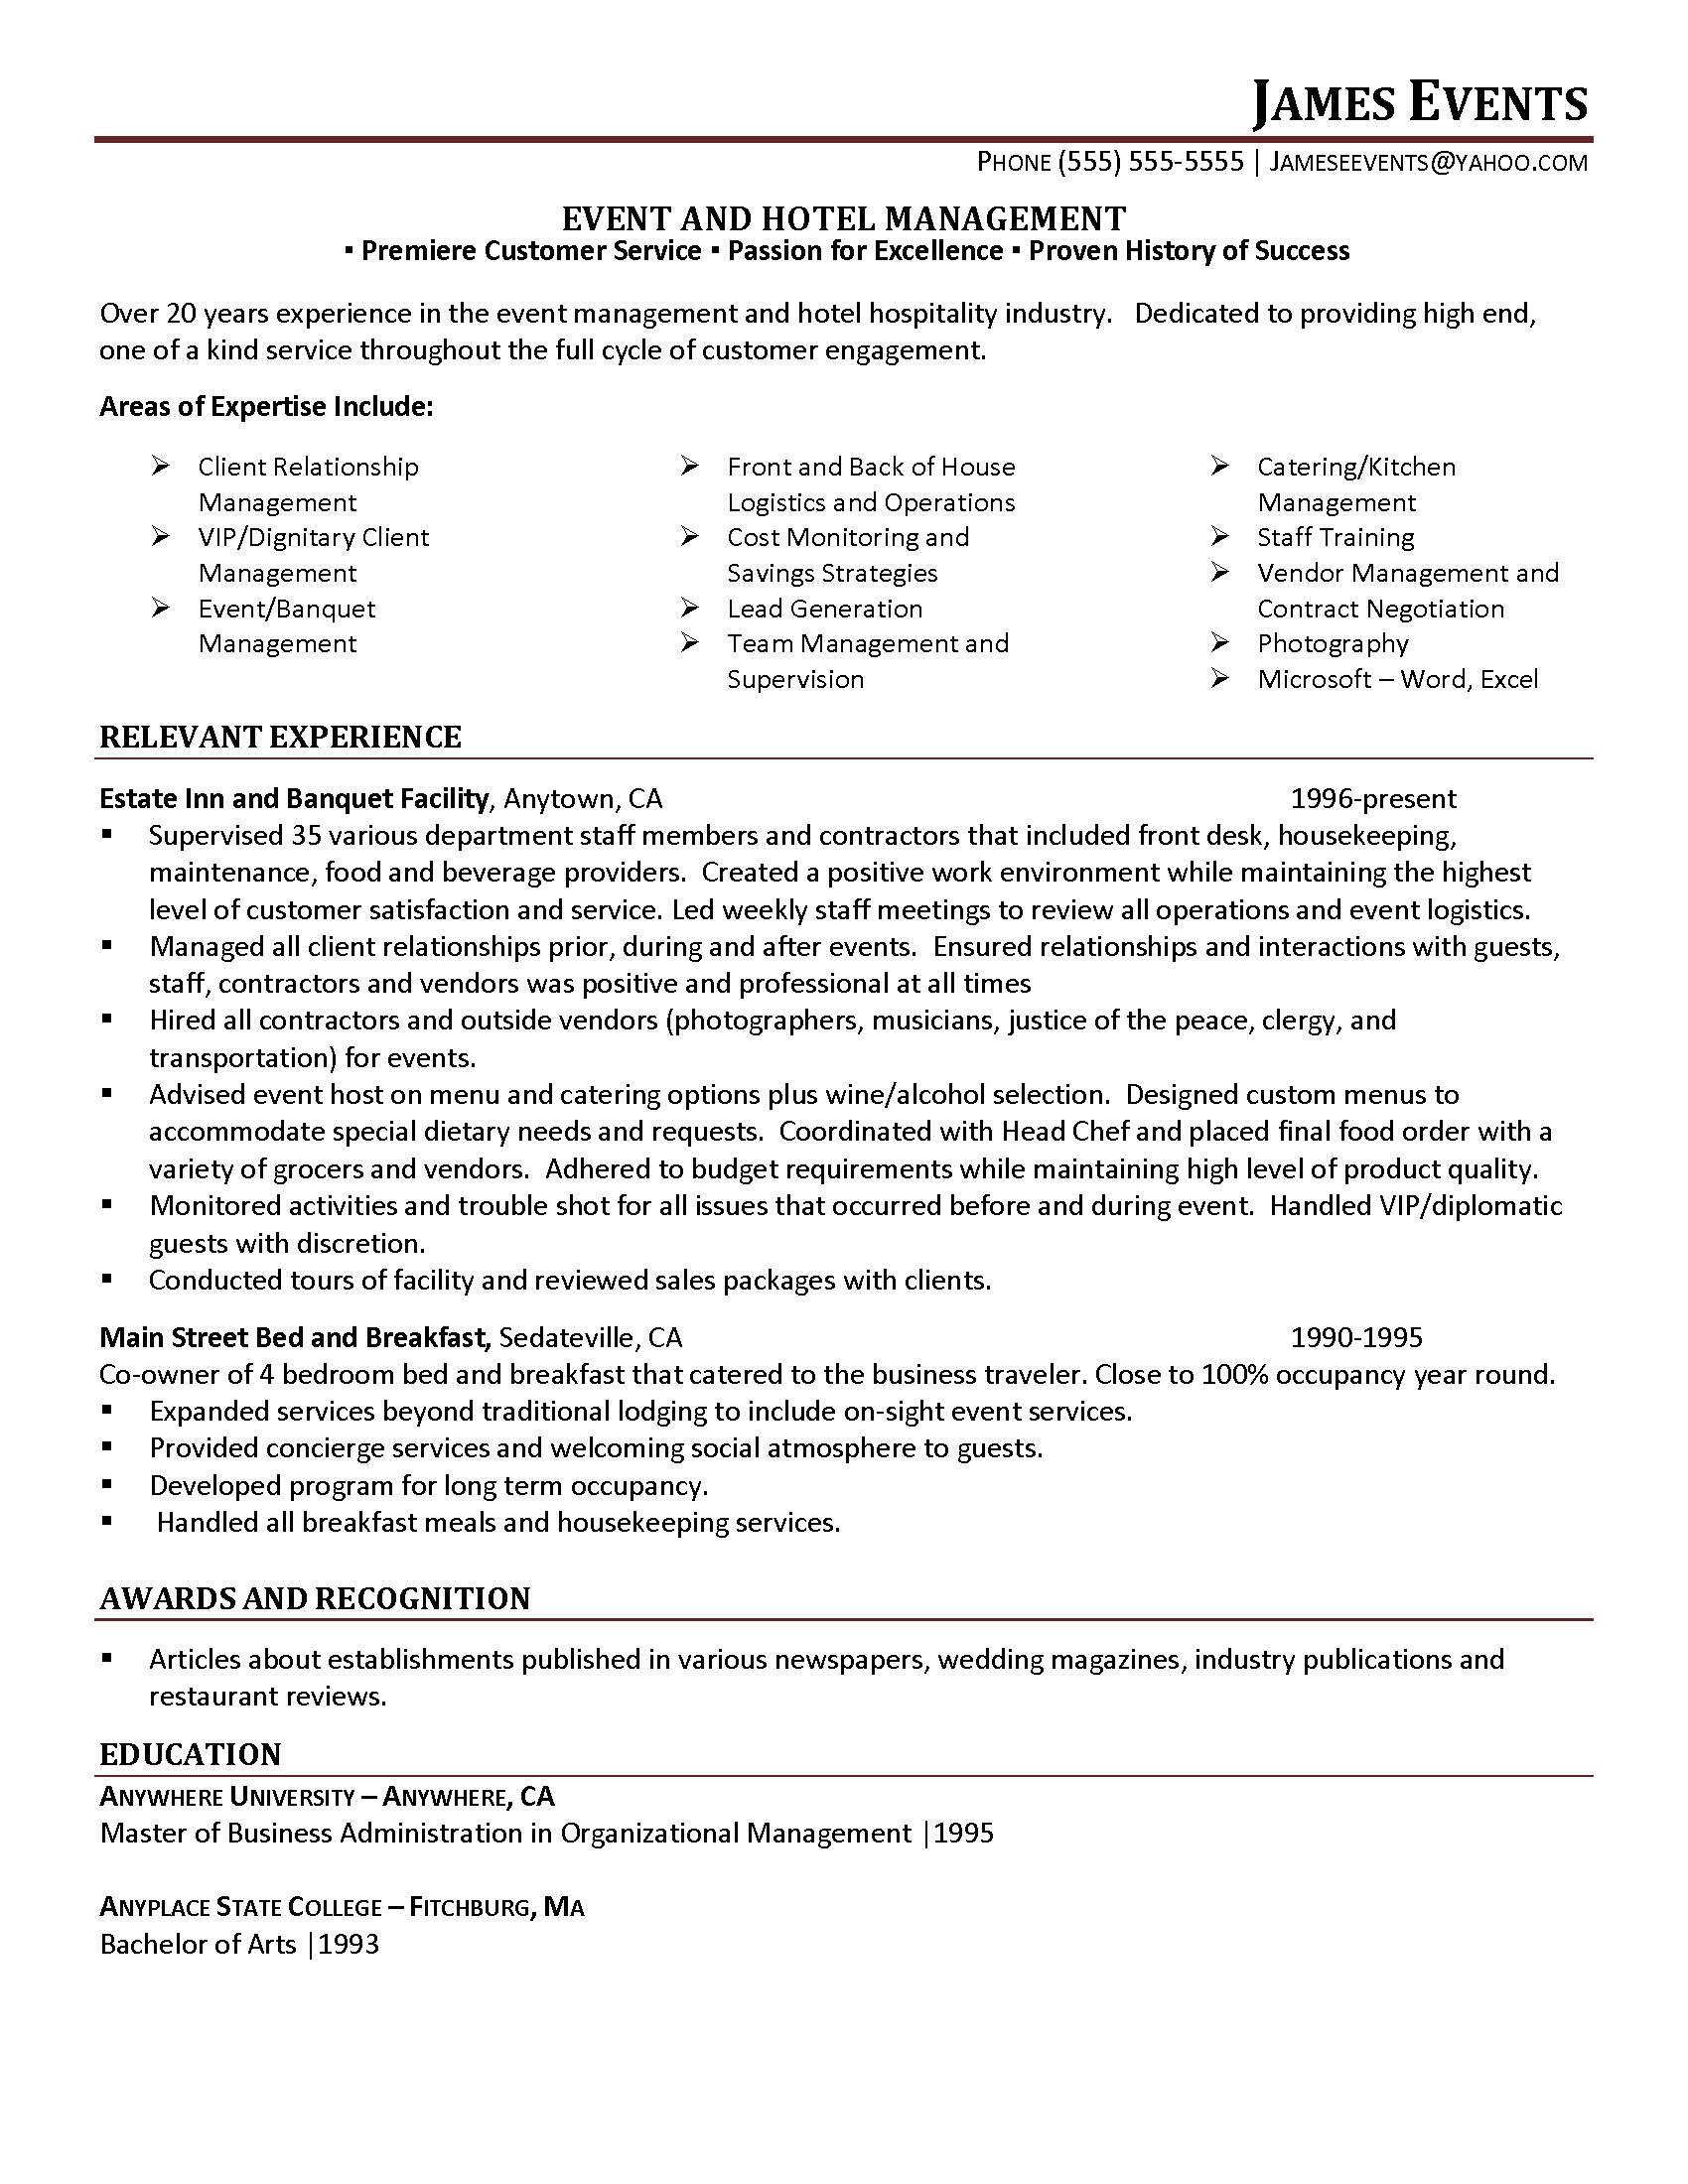 ross school of business resume format writingfixya web